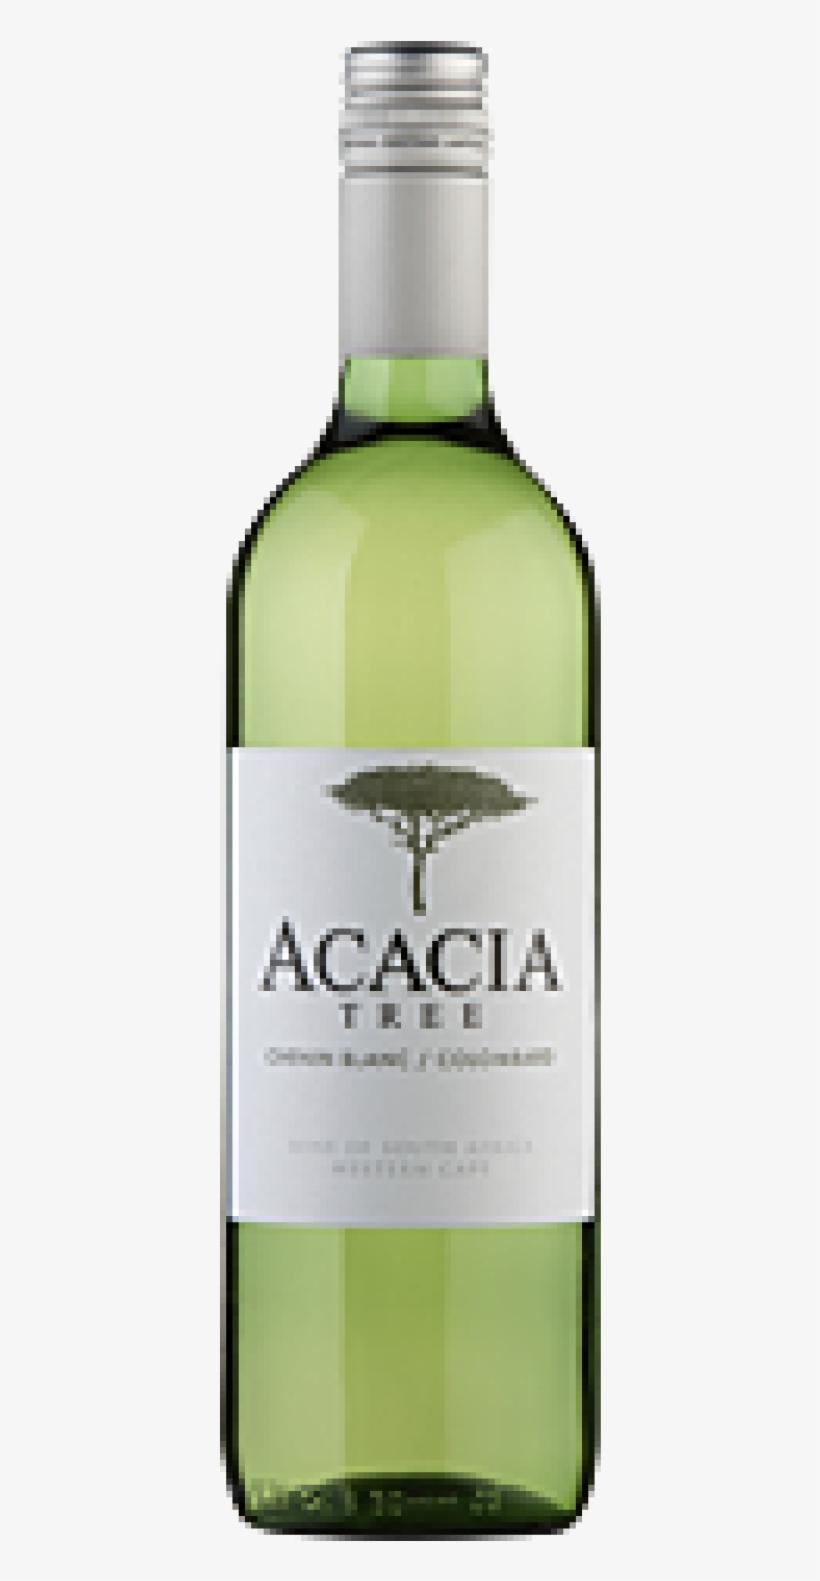 Acacia Tree Chenin Blanc - Tangled Tree Tropical Sauvignon Blanc, transparent png #4180221